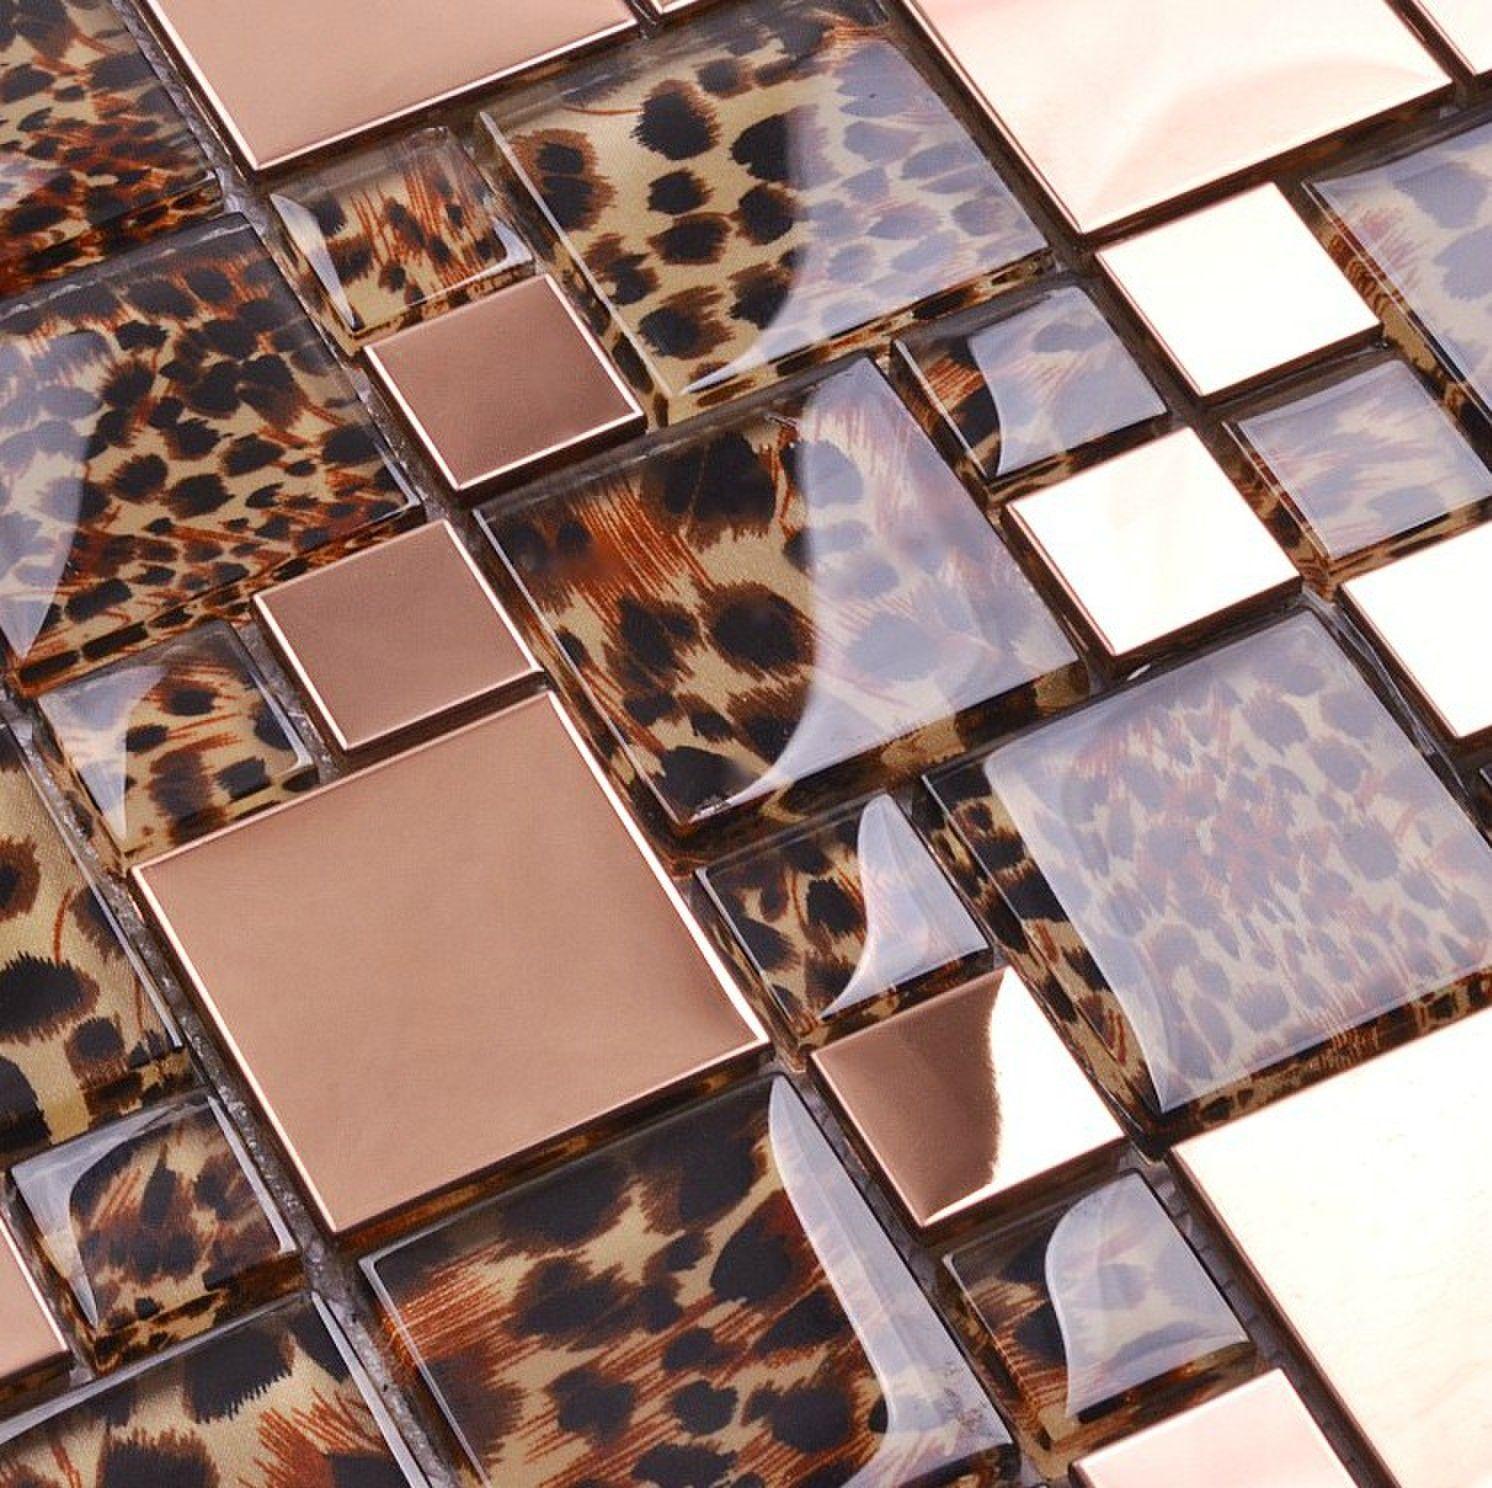 glass mosaic tile,glass mosaic tiles,glass tile,glass tile,mosaic ...